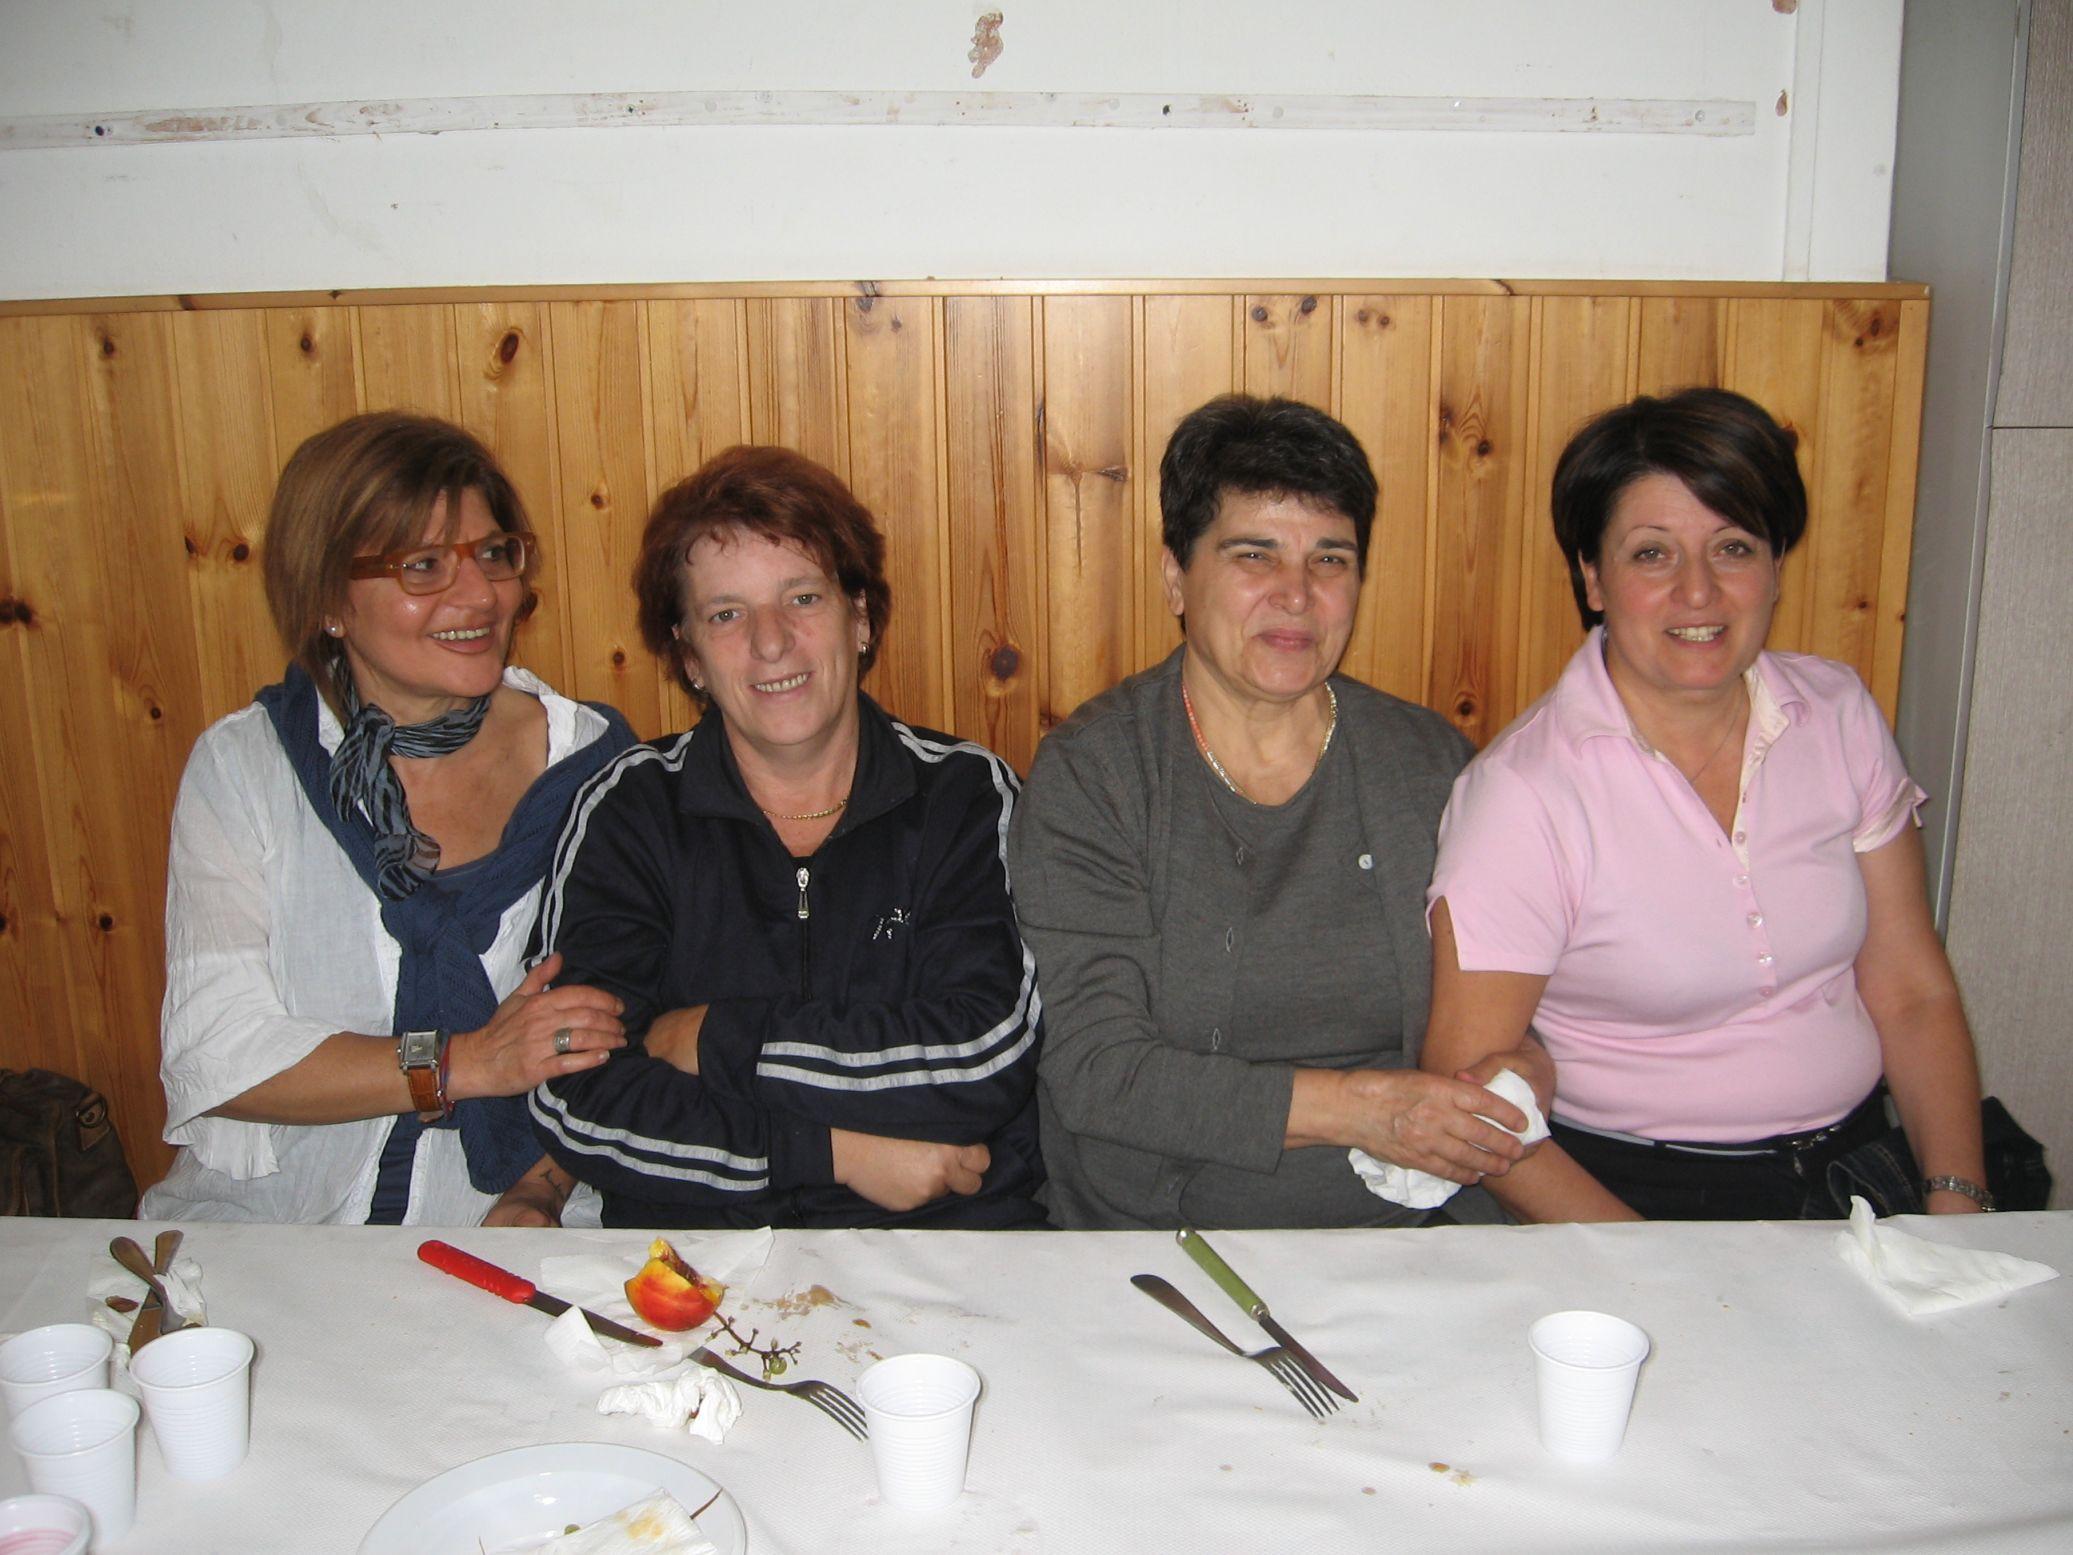 Bivacco_Persone_Impegnate_Torriglia-2009-09-20--14.14.59